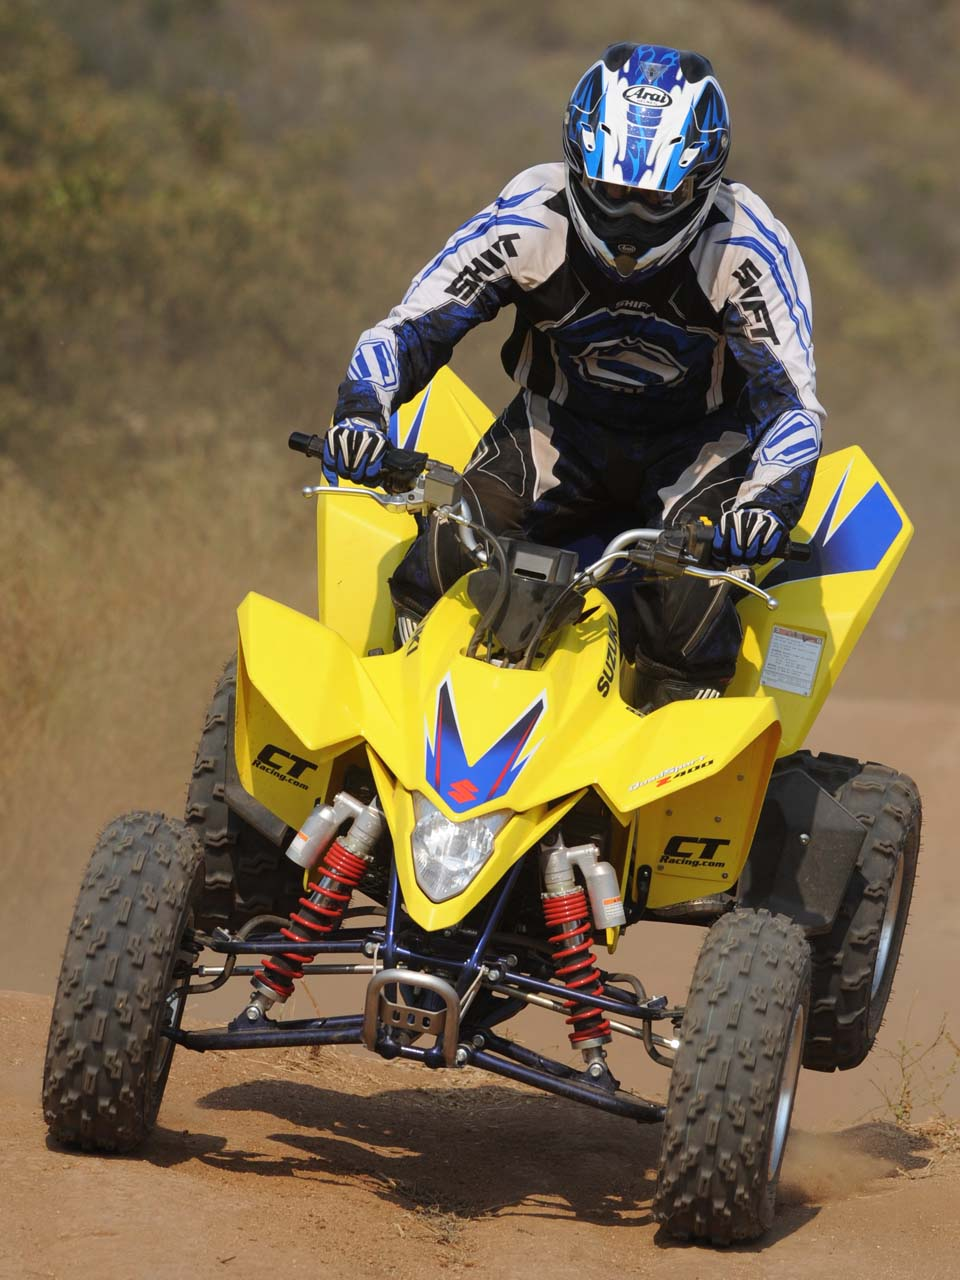 Best Side By Side Utv >> Best Sport ATV - The 2011 Suzuki LTZ 400 | ATV Illustrated